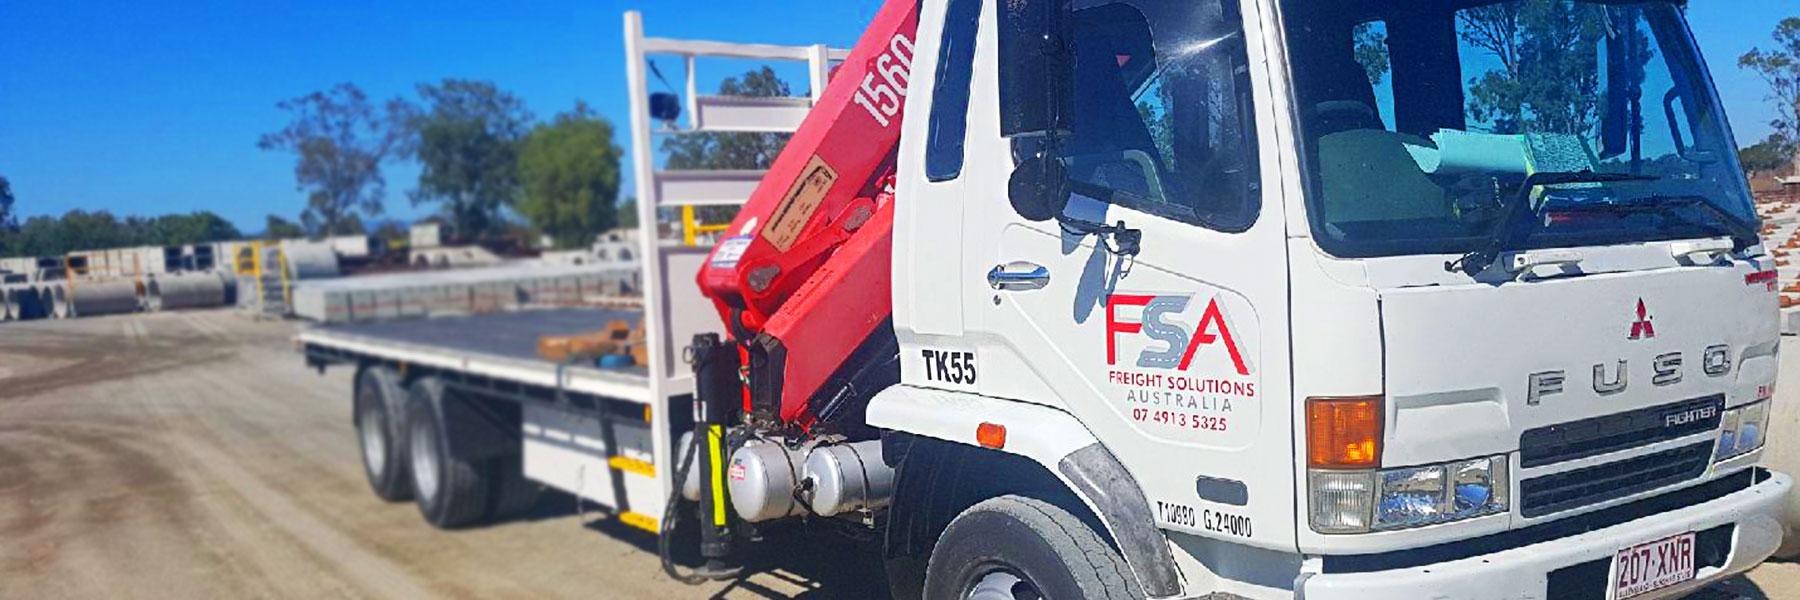 Freight Solution Australia crane truck 3